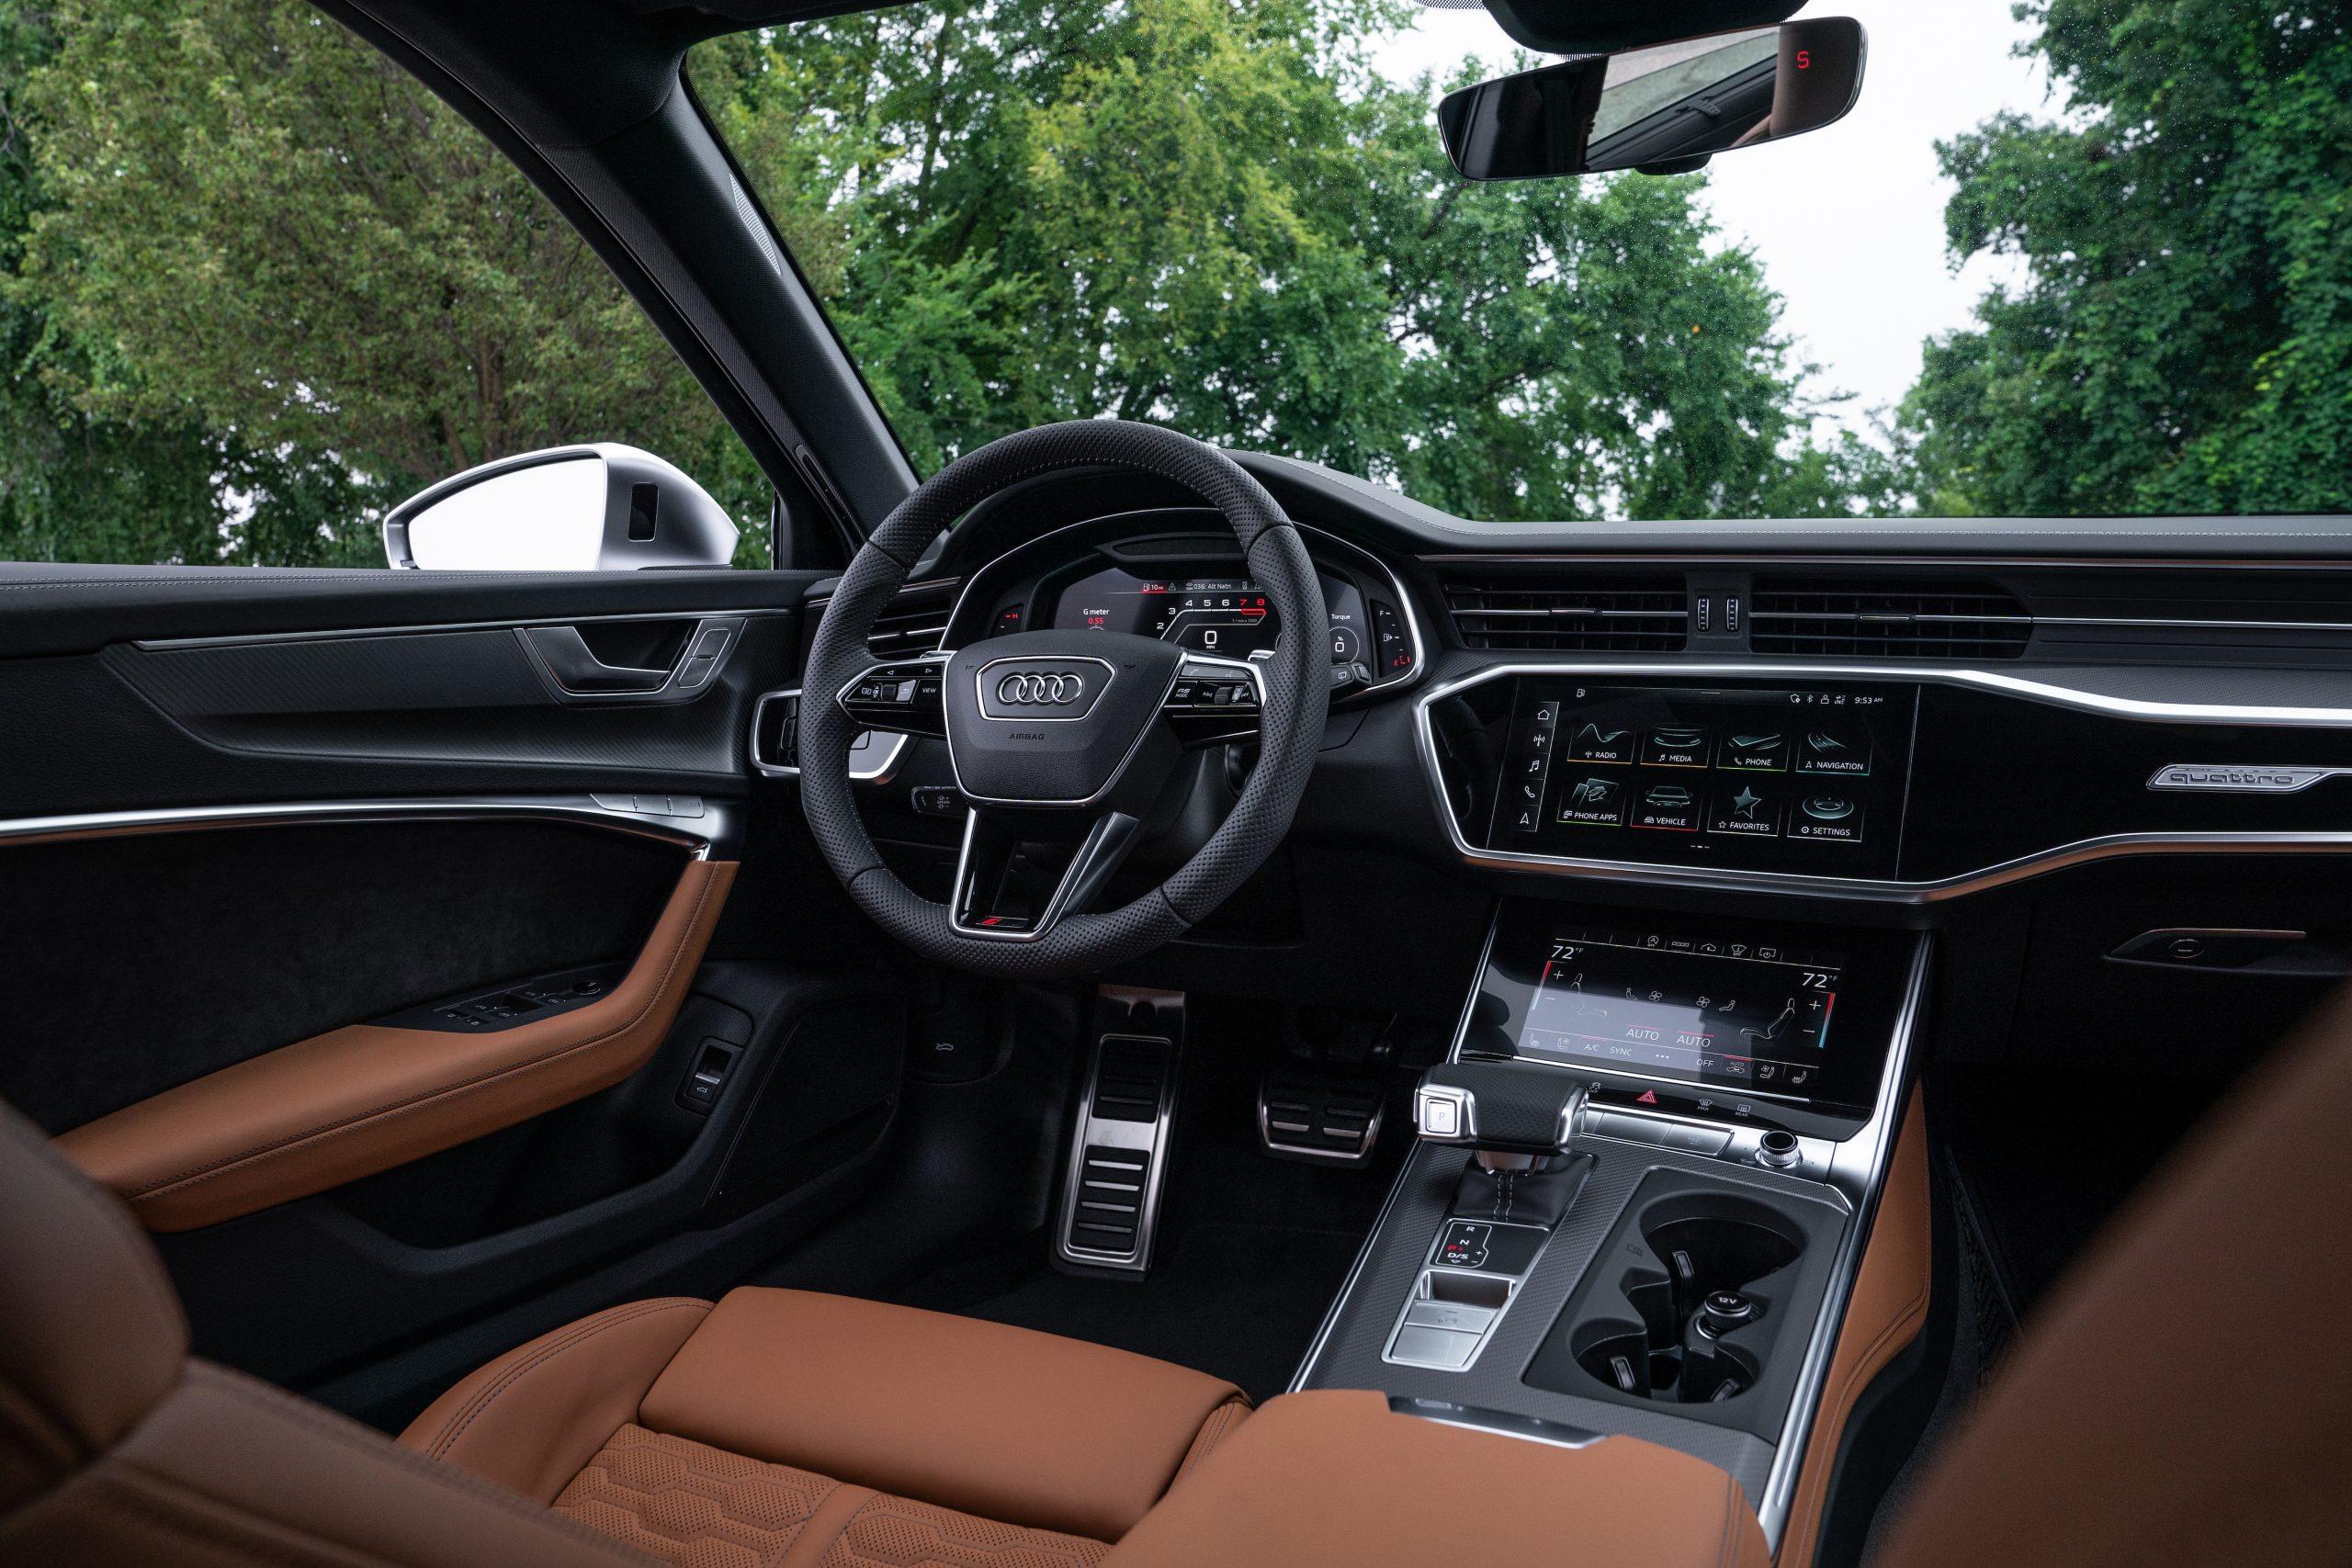 RS 6 Avant Nardo Gray interior front dash angle